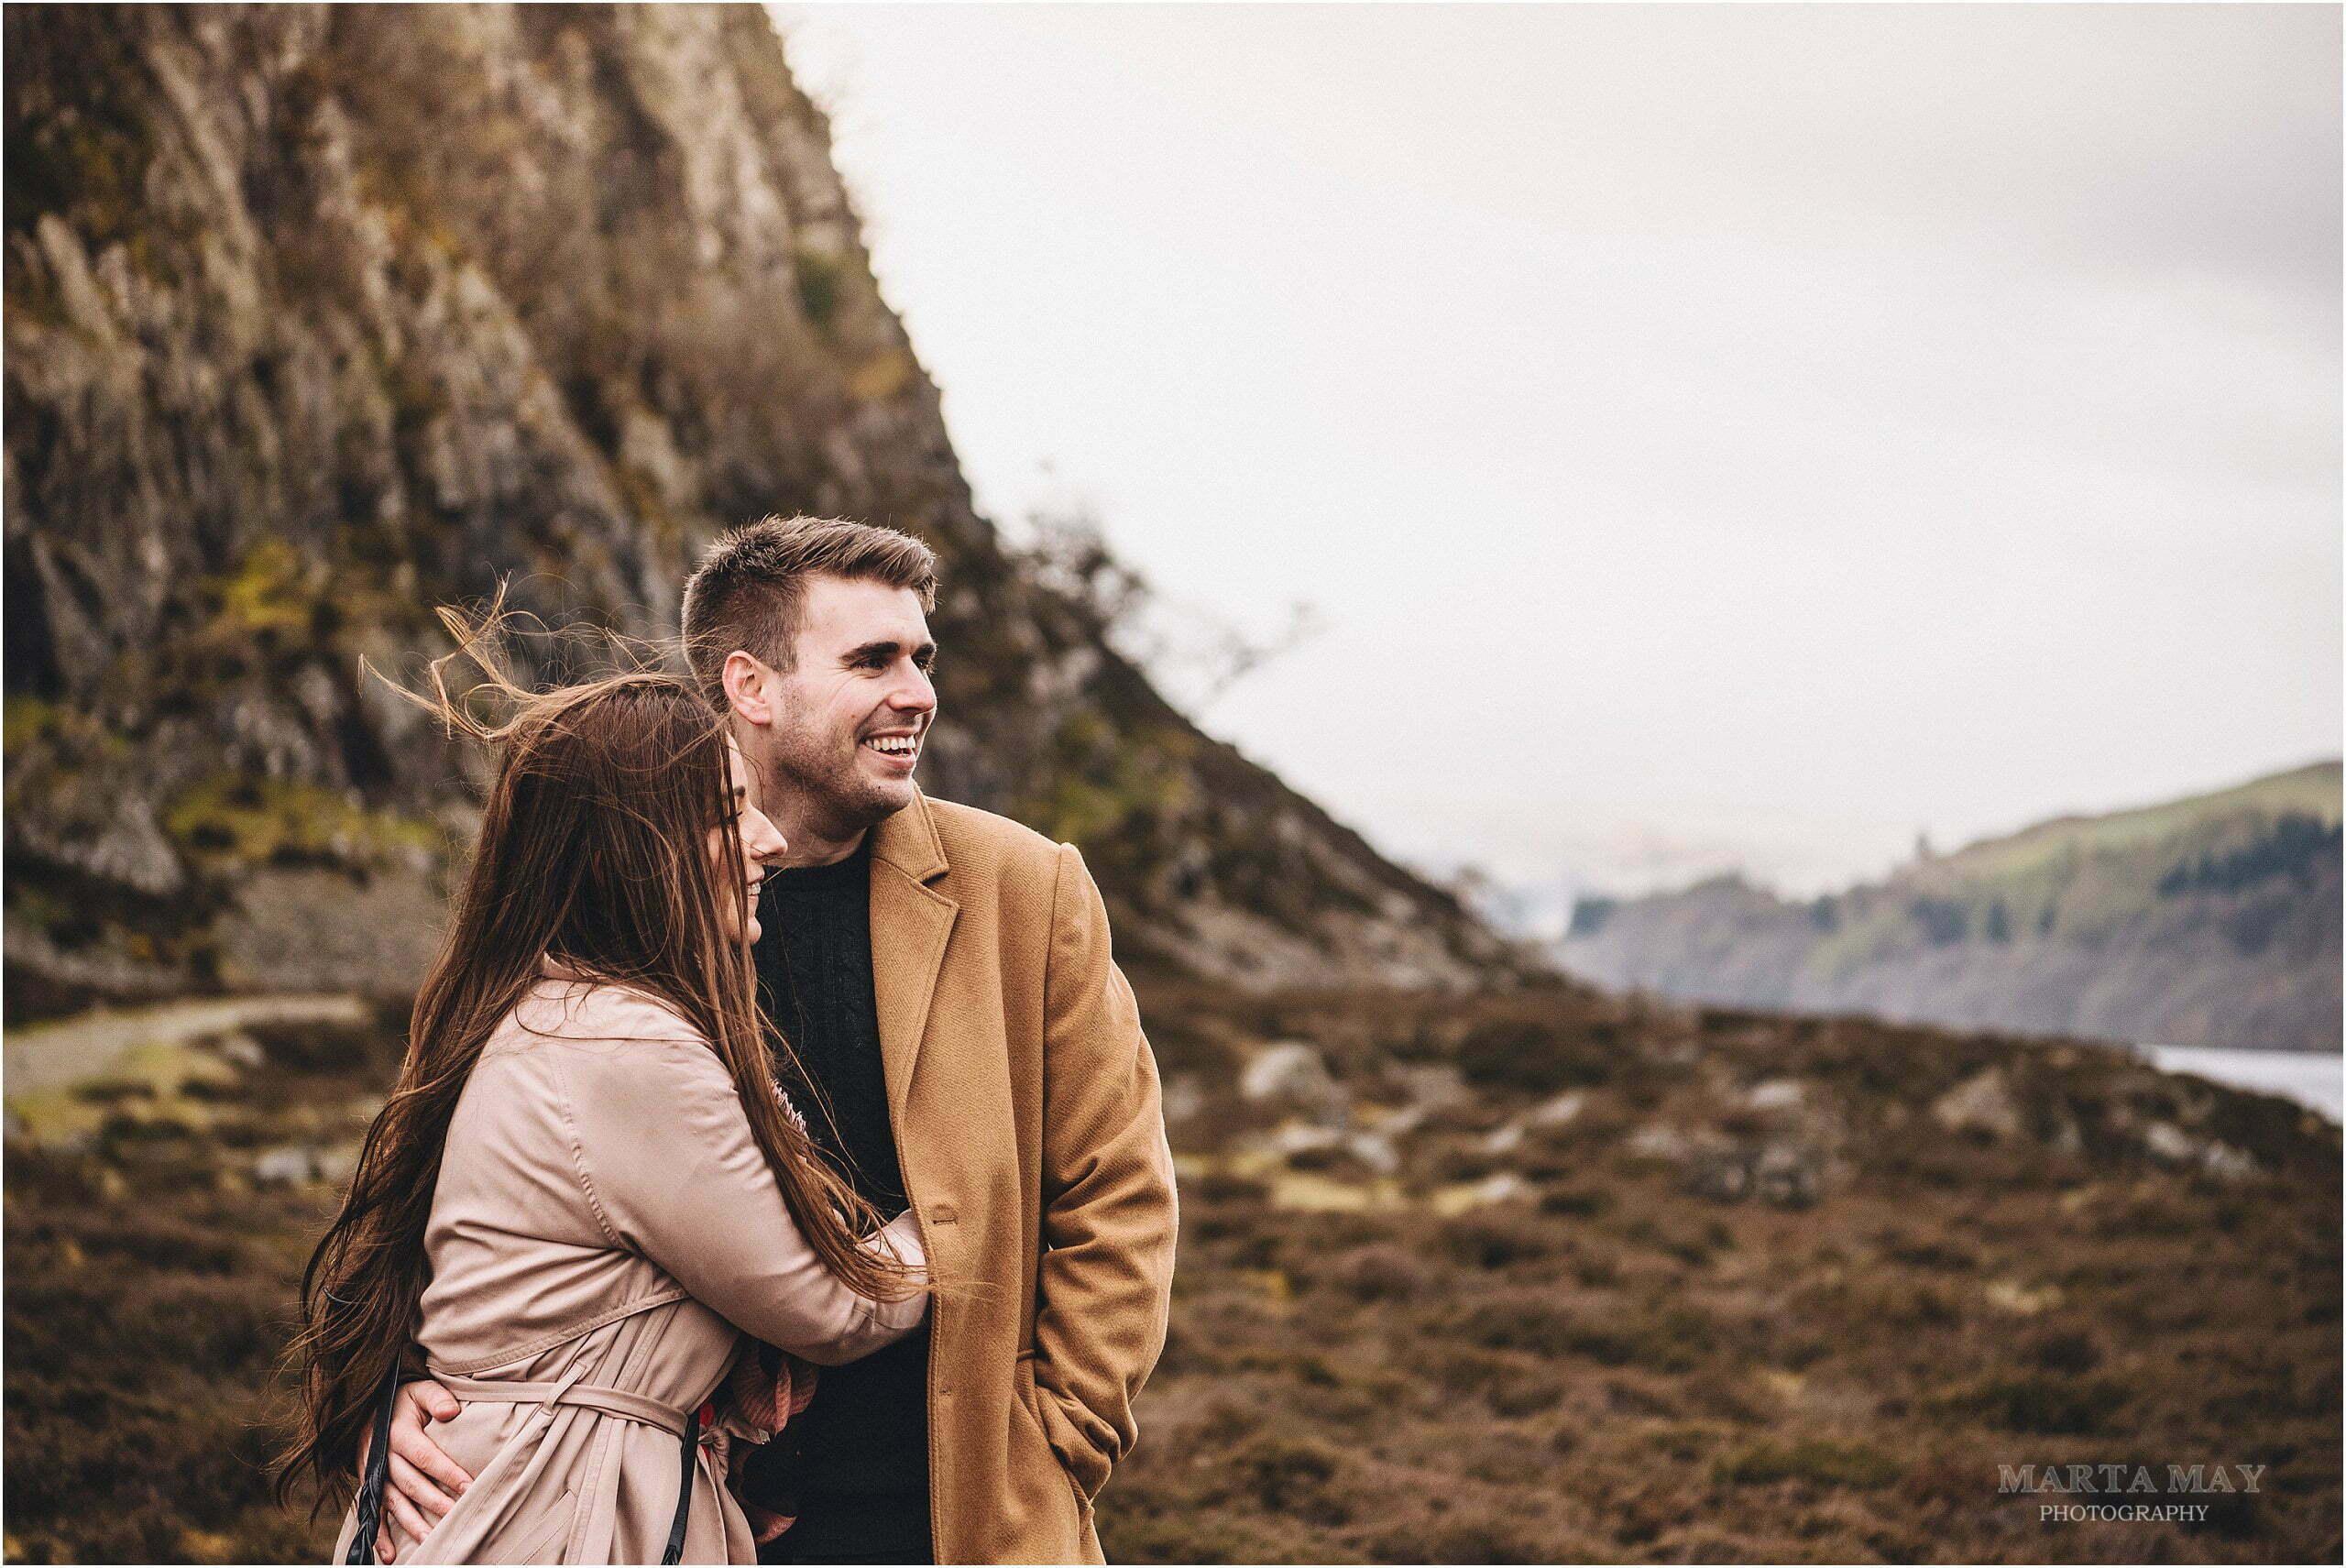 Elan Valley engagement photography